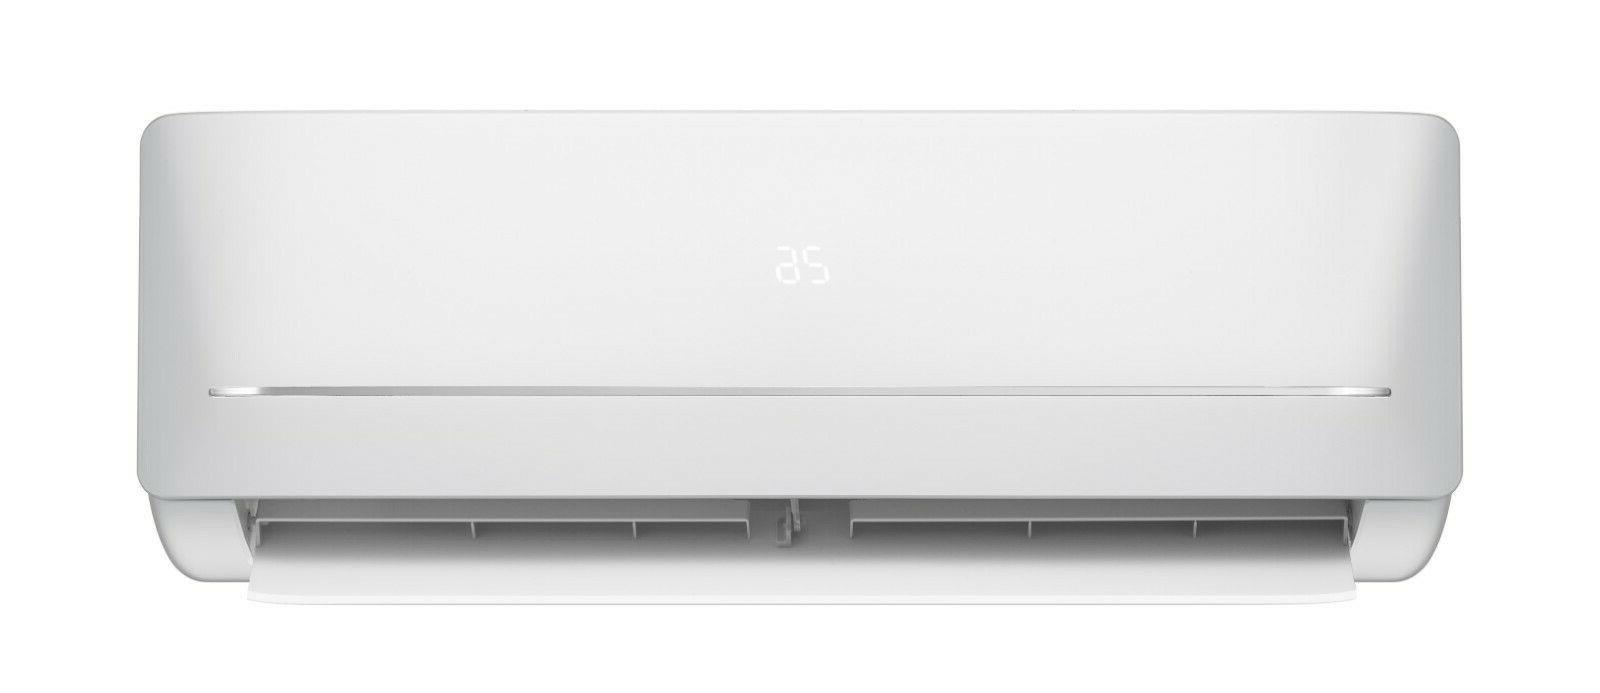 KMB KAC-18CH 18000BTU Ductless Mini-Split Air Conditioner He